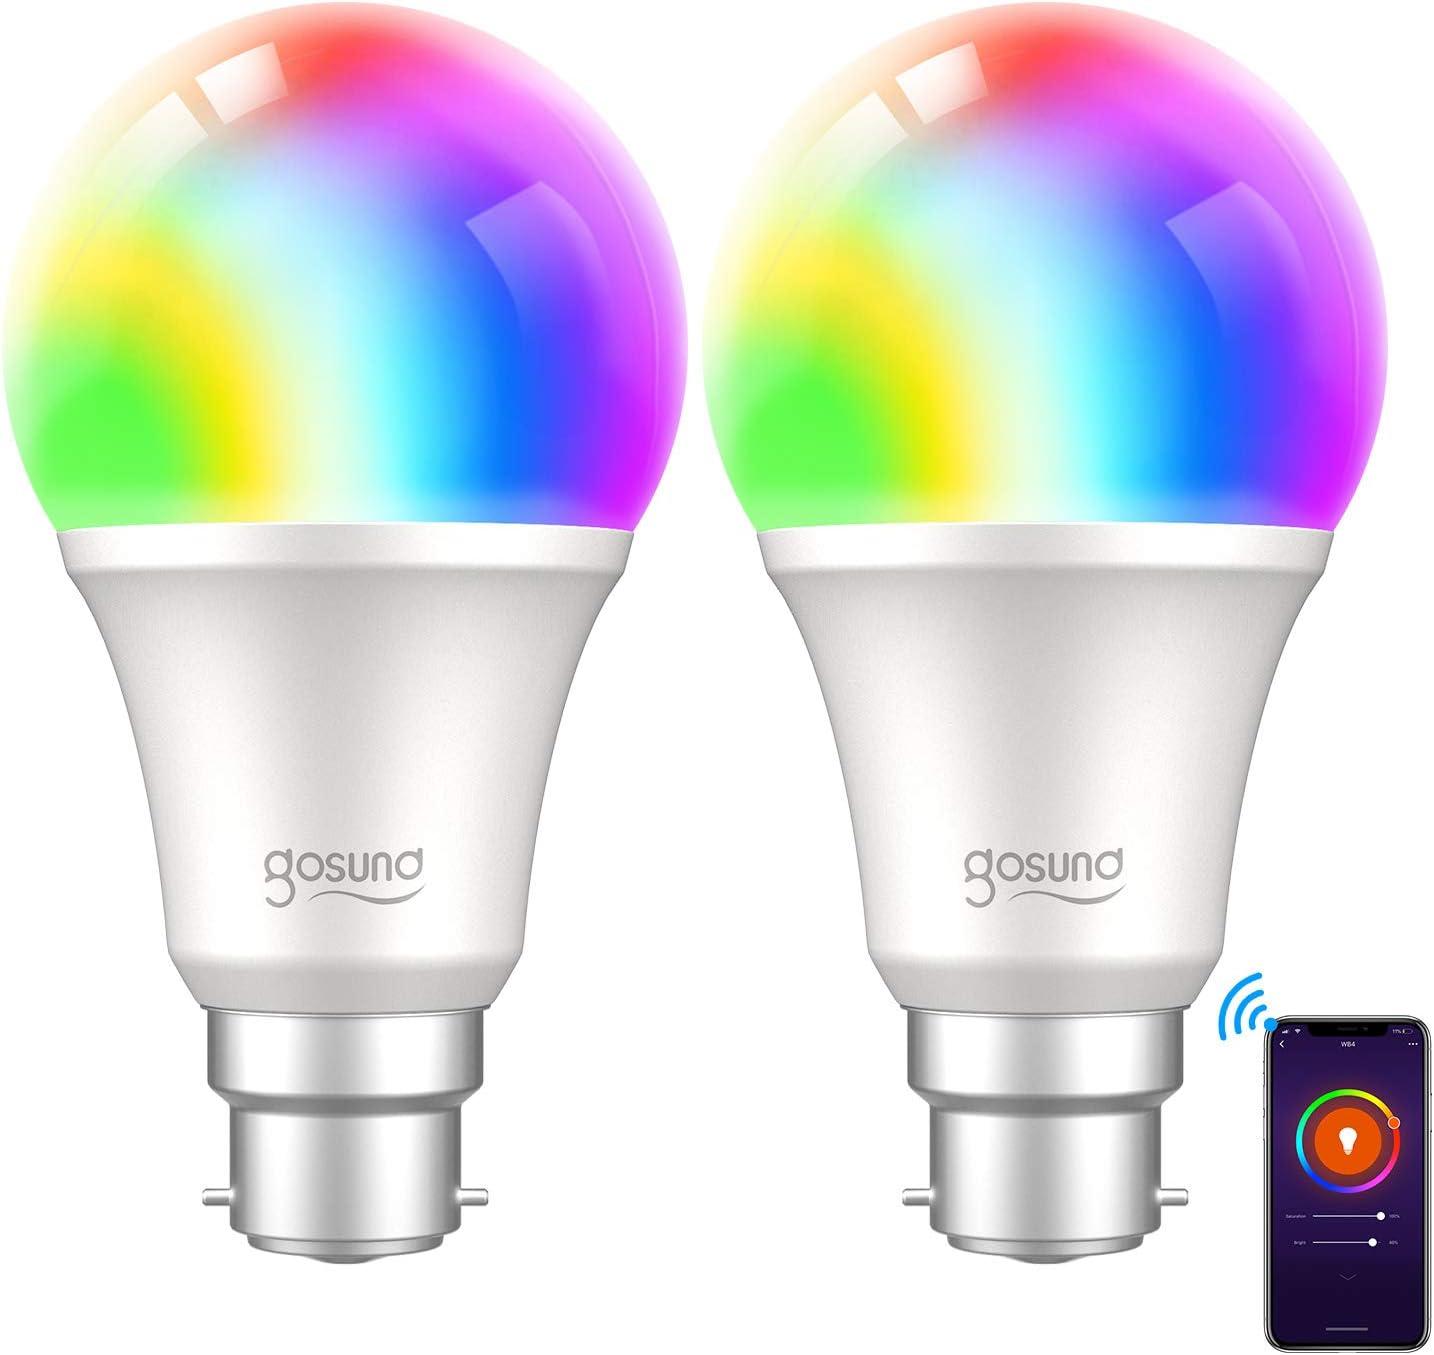 MoKo Smart WLAN LED Lamp, GU10 5 W, Dimmable Light: Amazon